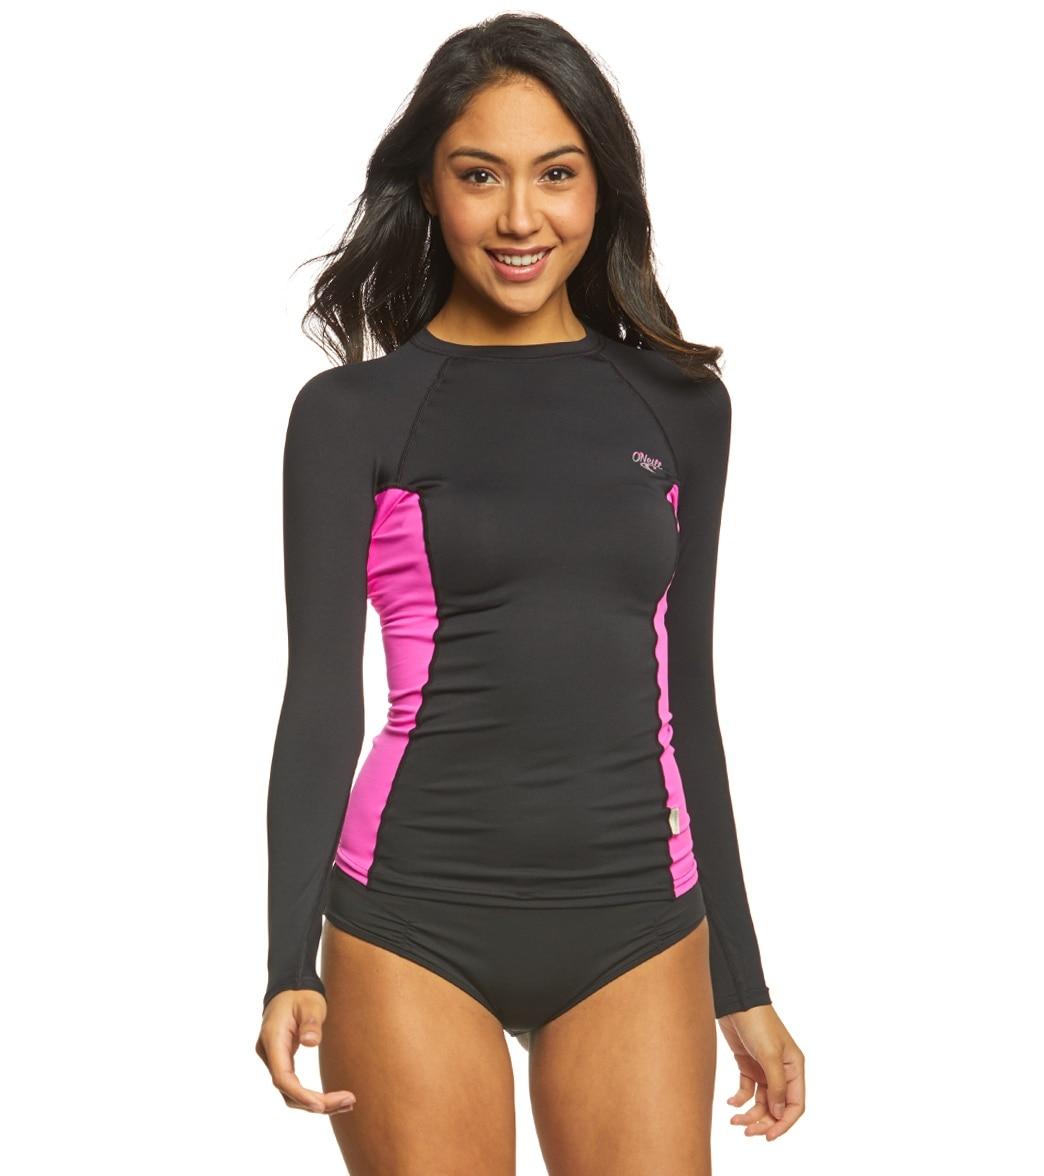 6de10aee4f O Neill Women s Premium Long Sleeve Crew Rashguard at SwimOutlet.com